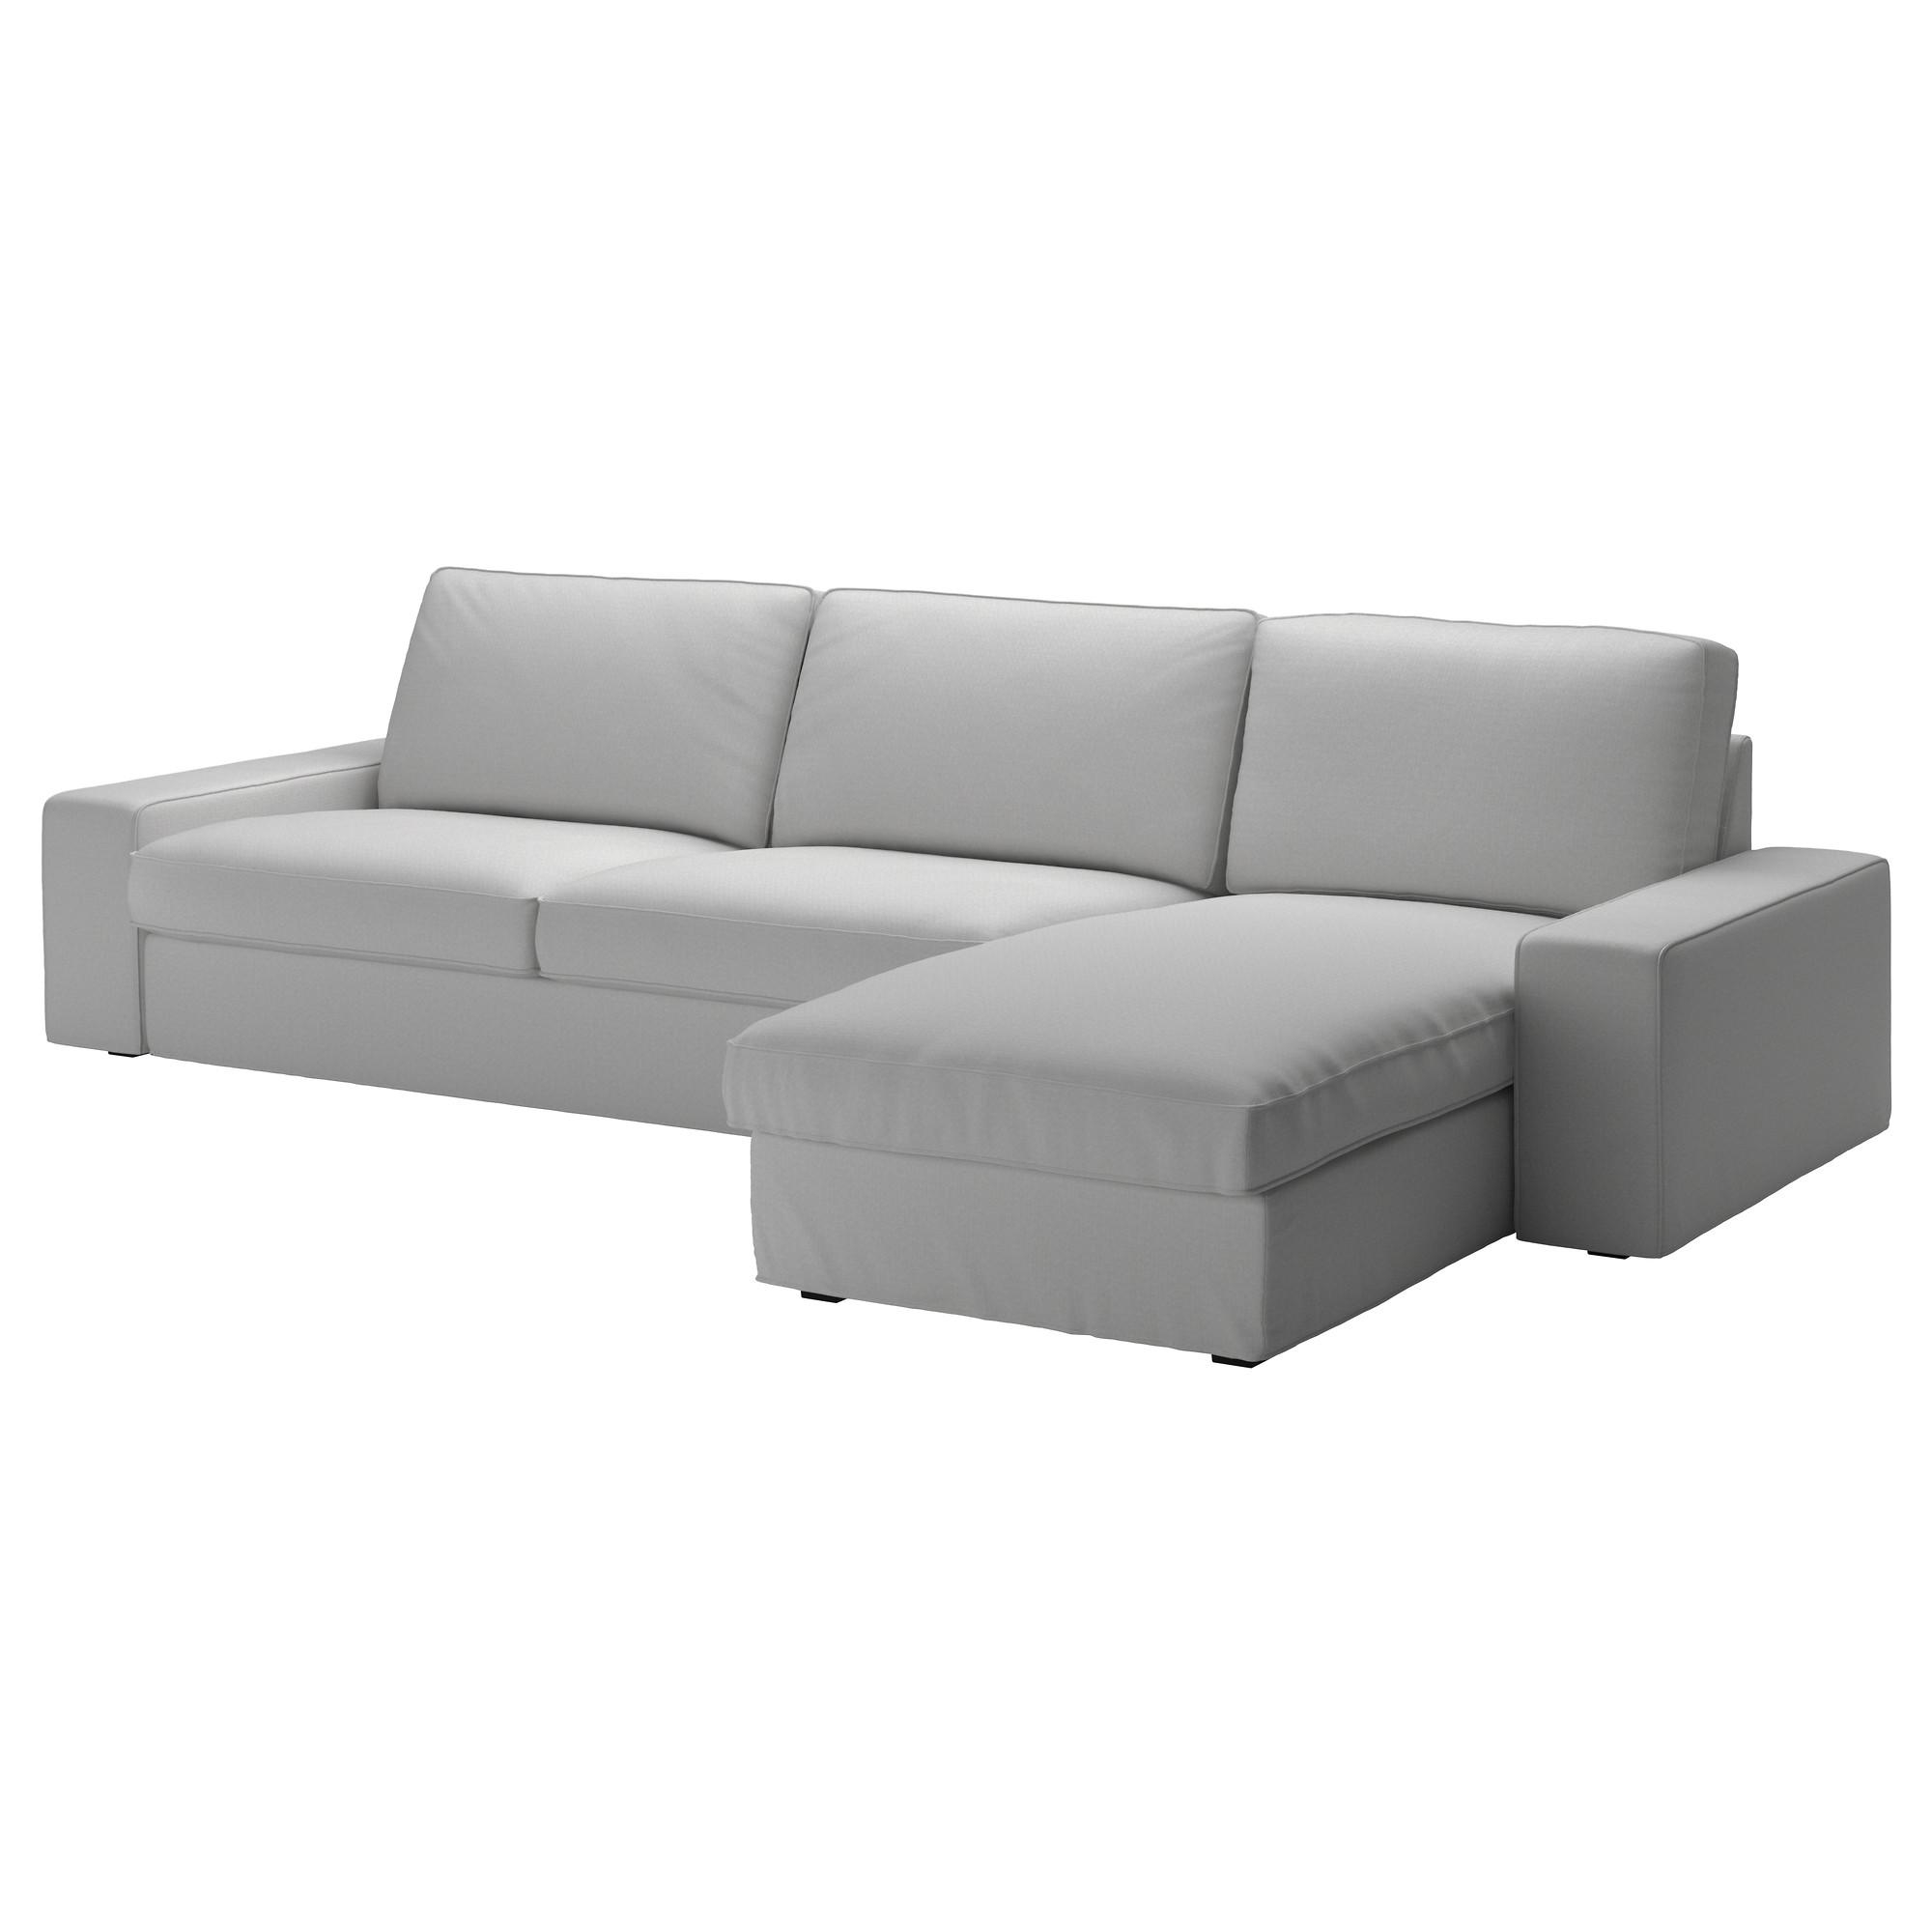 Kivik Sectional, 4 Seat – Orrsta Light Gray – Ikea With Regard To Gray Sofas (Image 10 of 20)